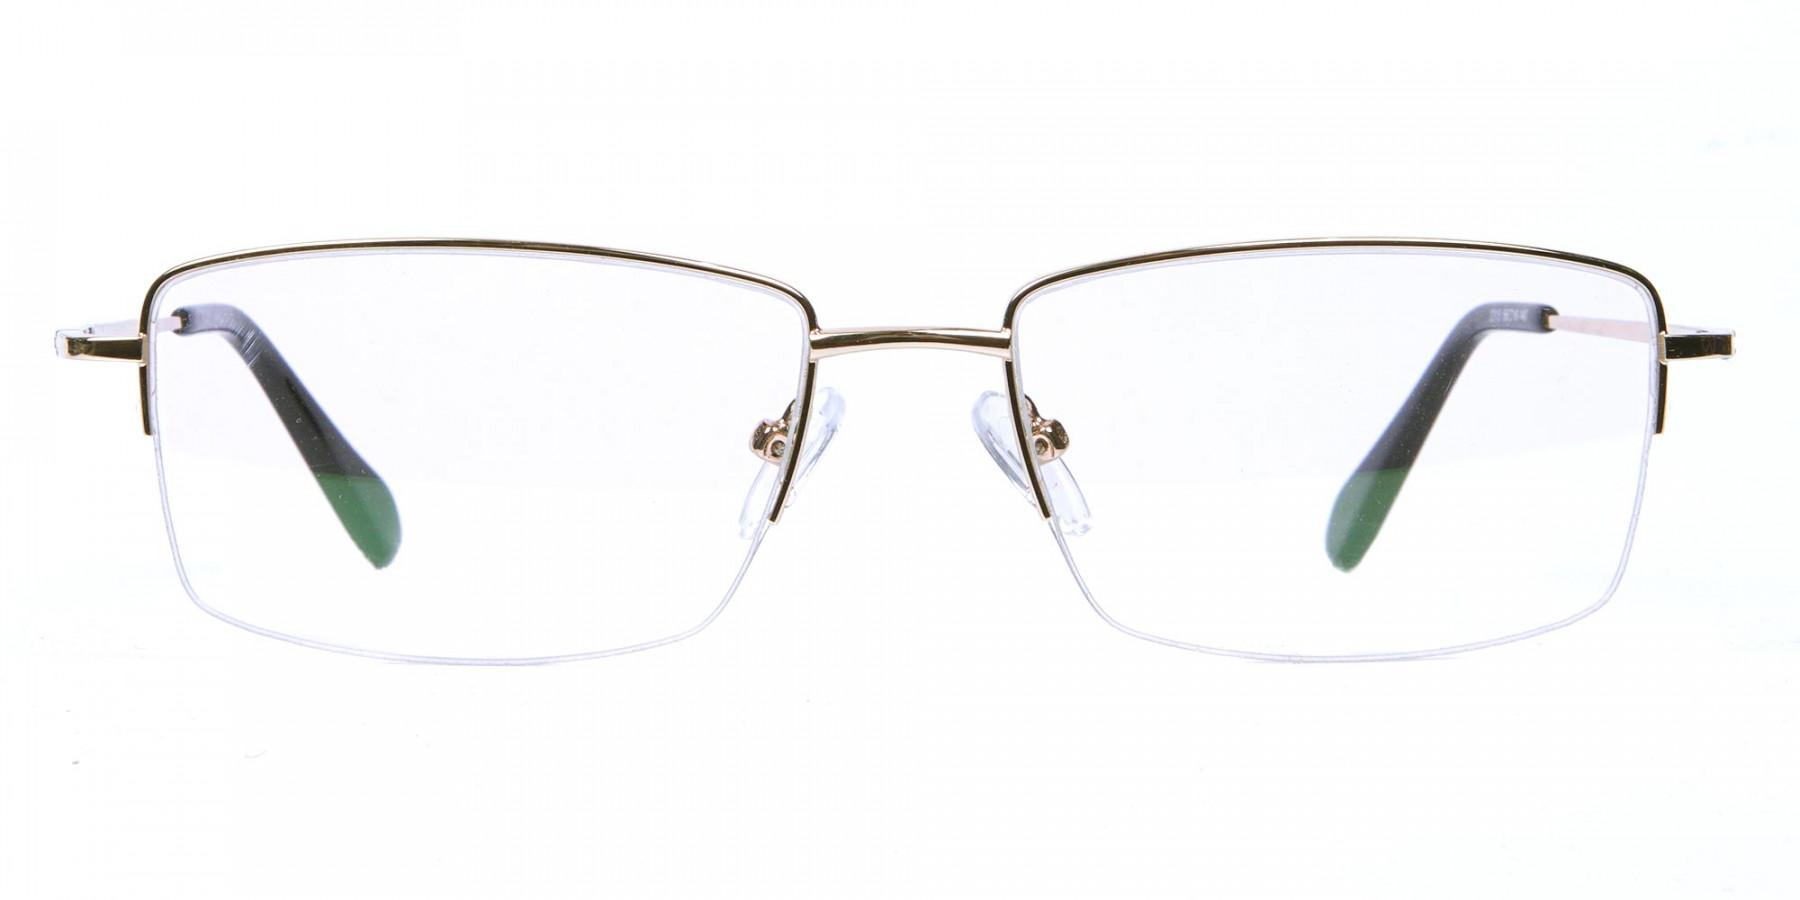 Gold Half-Rim Spiffy Frames -1